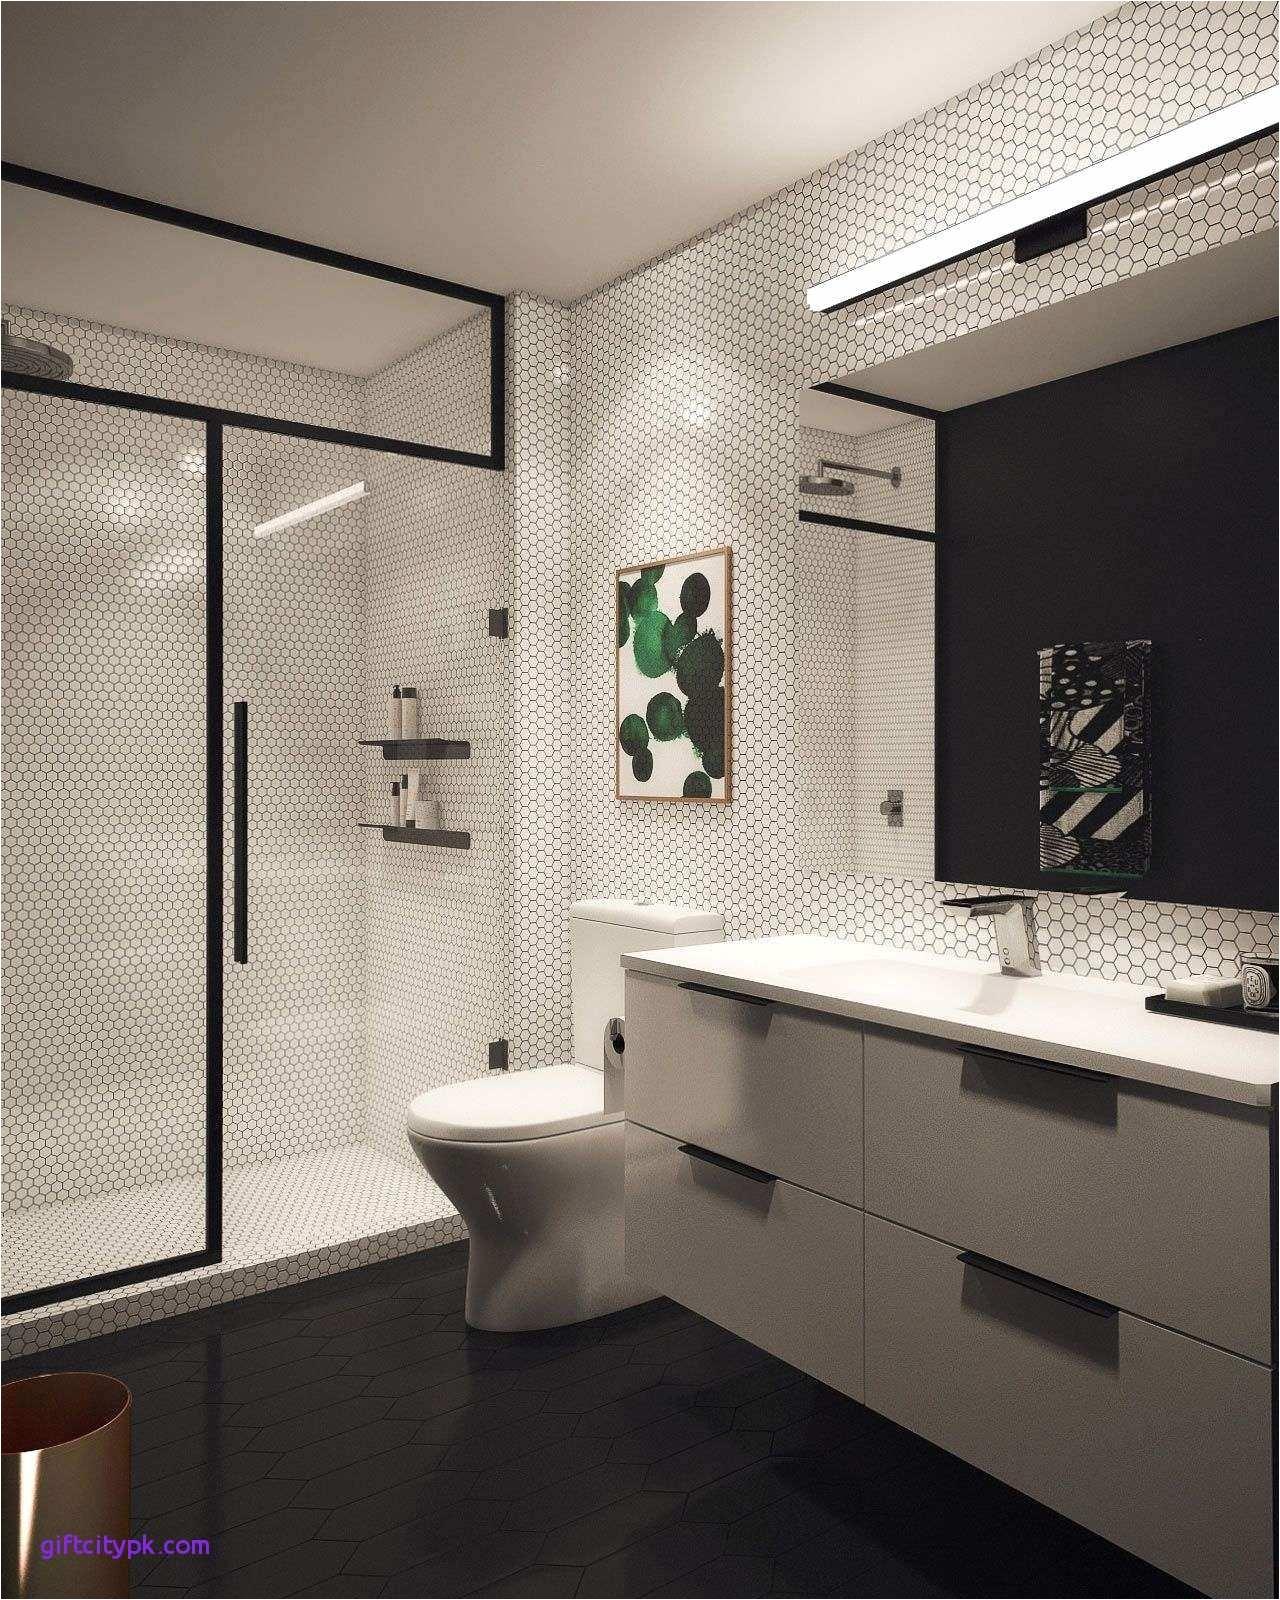 Bathroom Fixtures Design Ideas Best toilet Designs Tcitypk Tcitypk